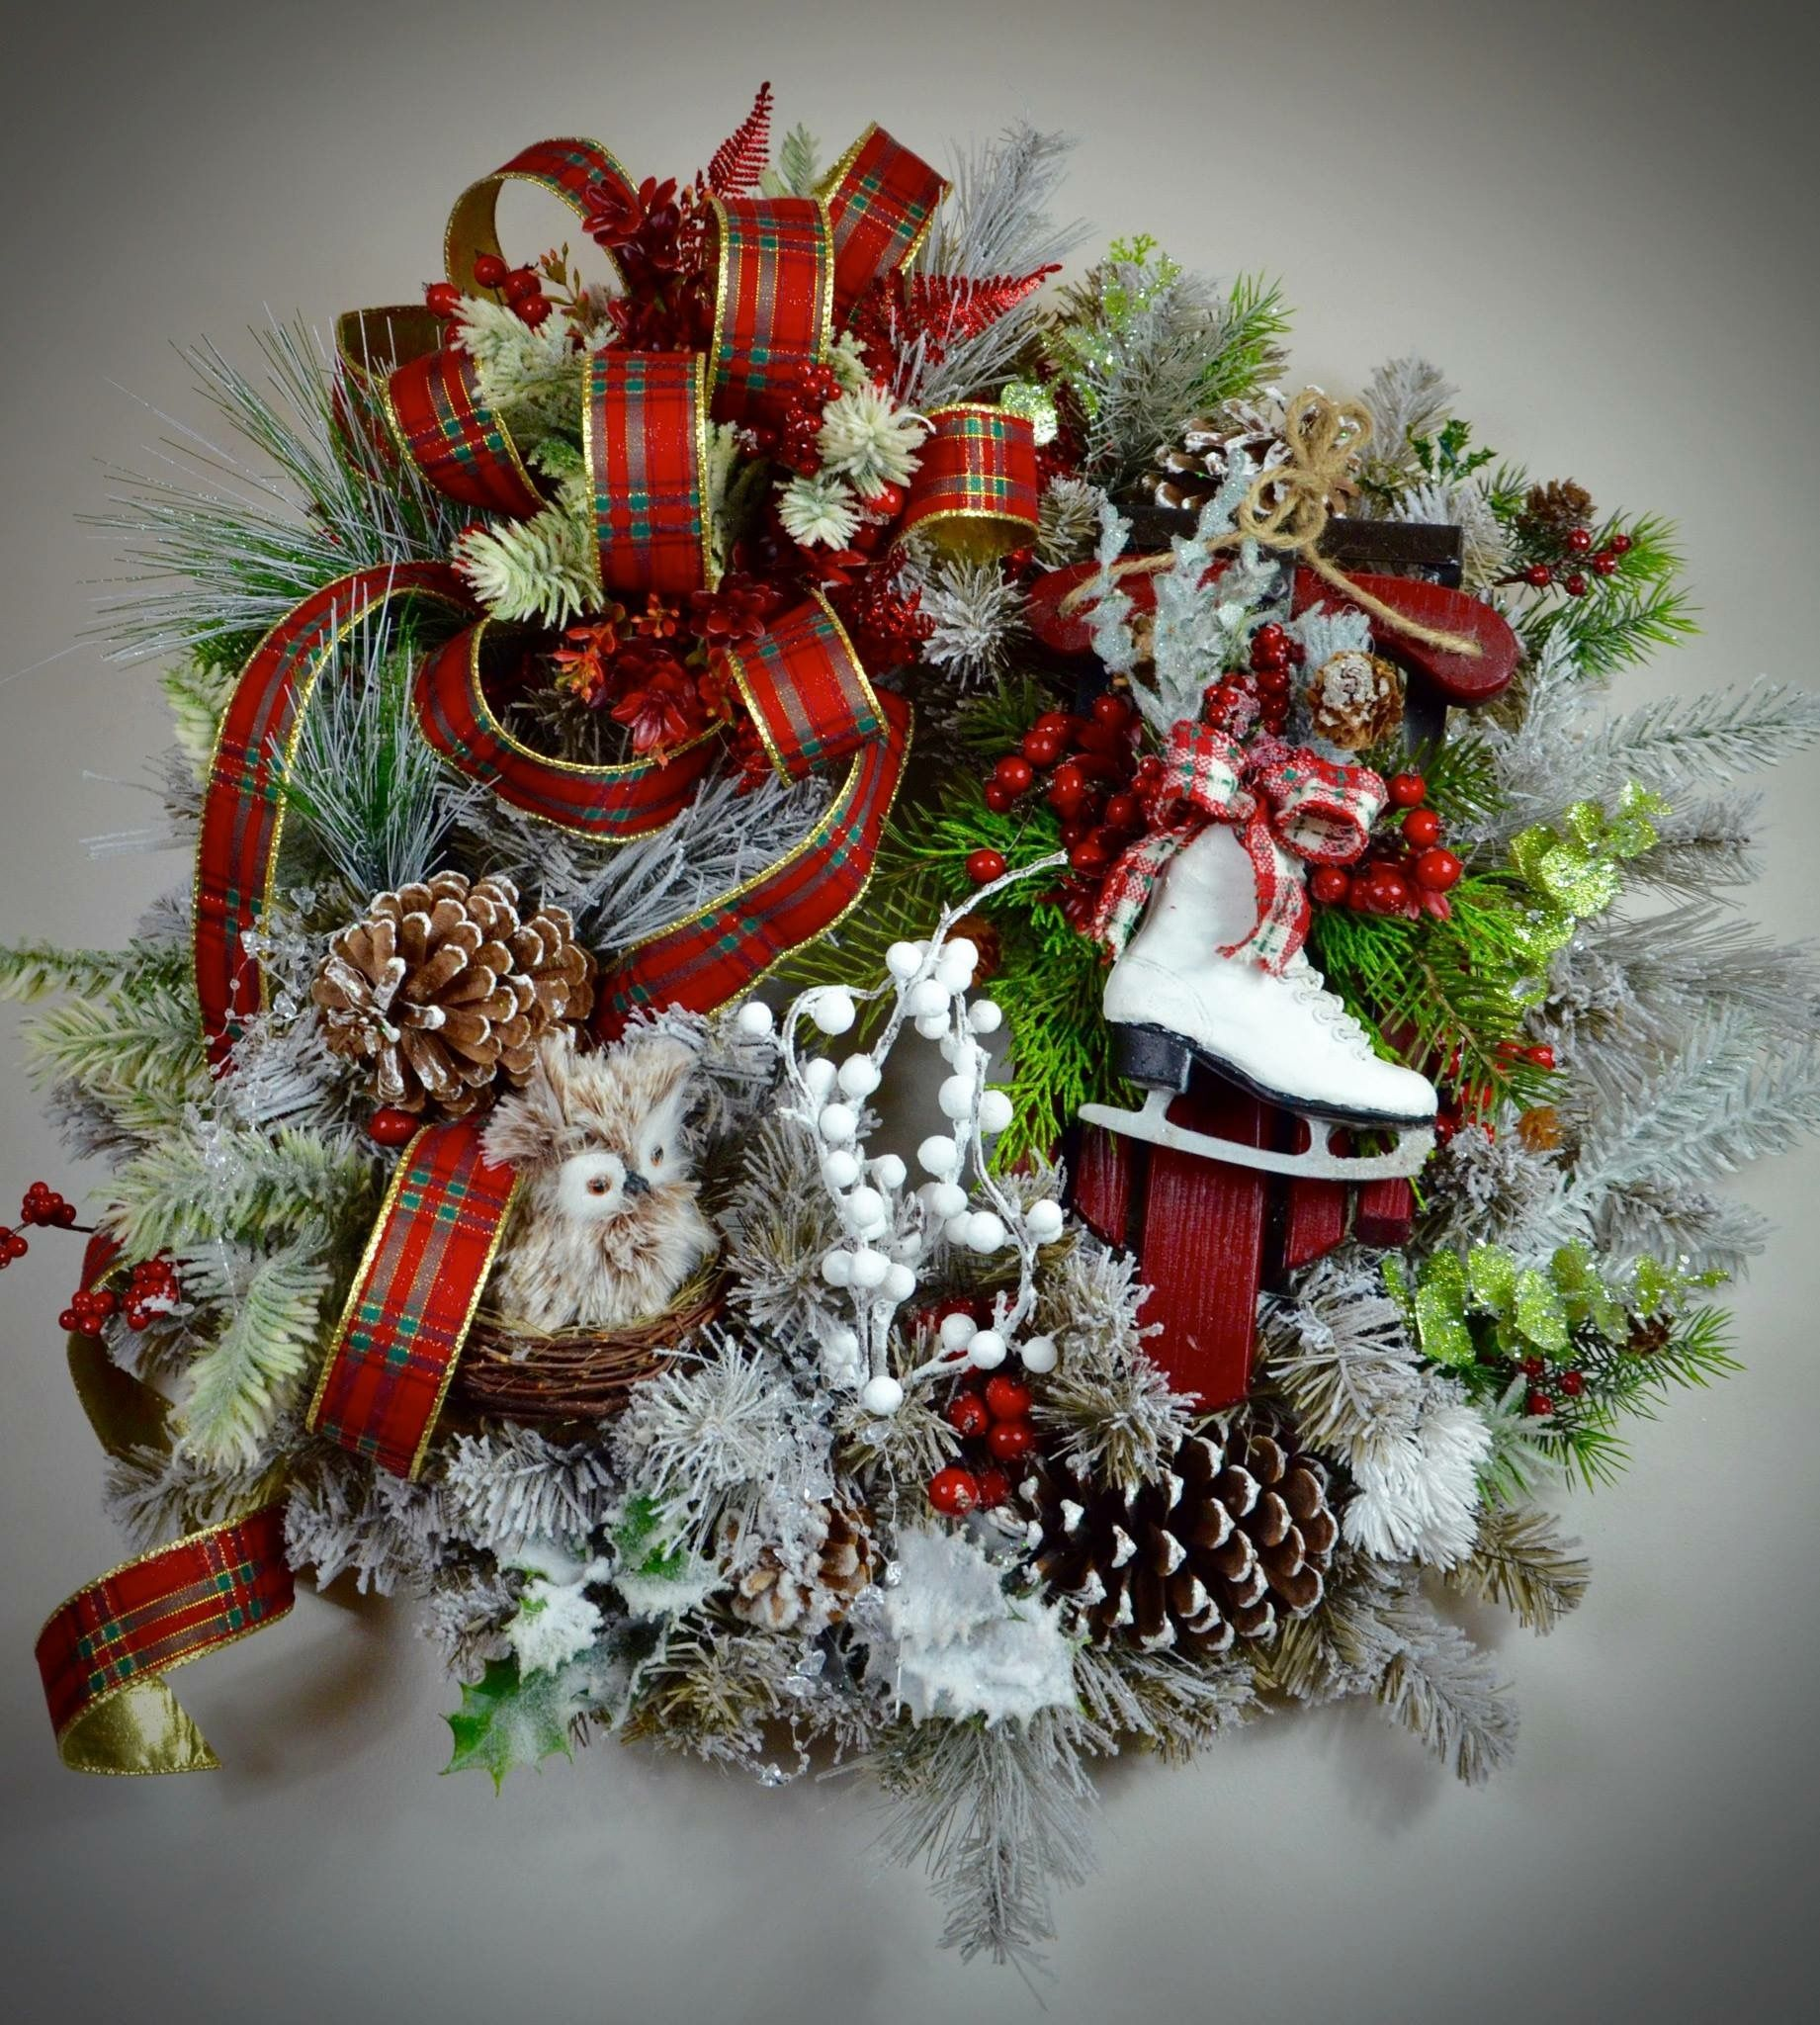 Pin by Wreaths of Joy on Wreaths ideas Pinterest